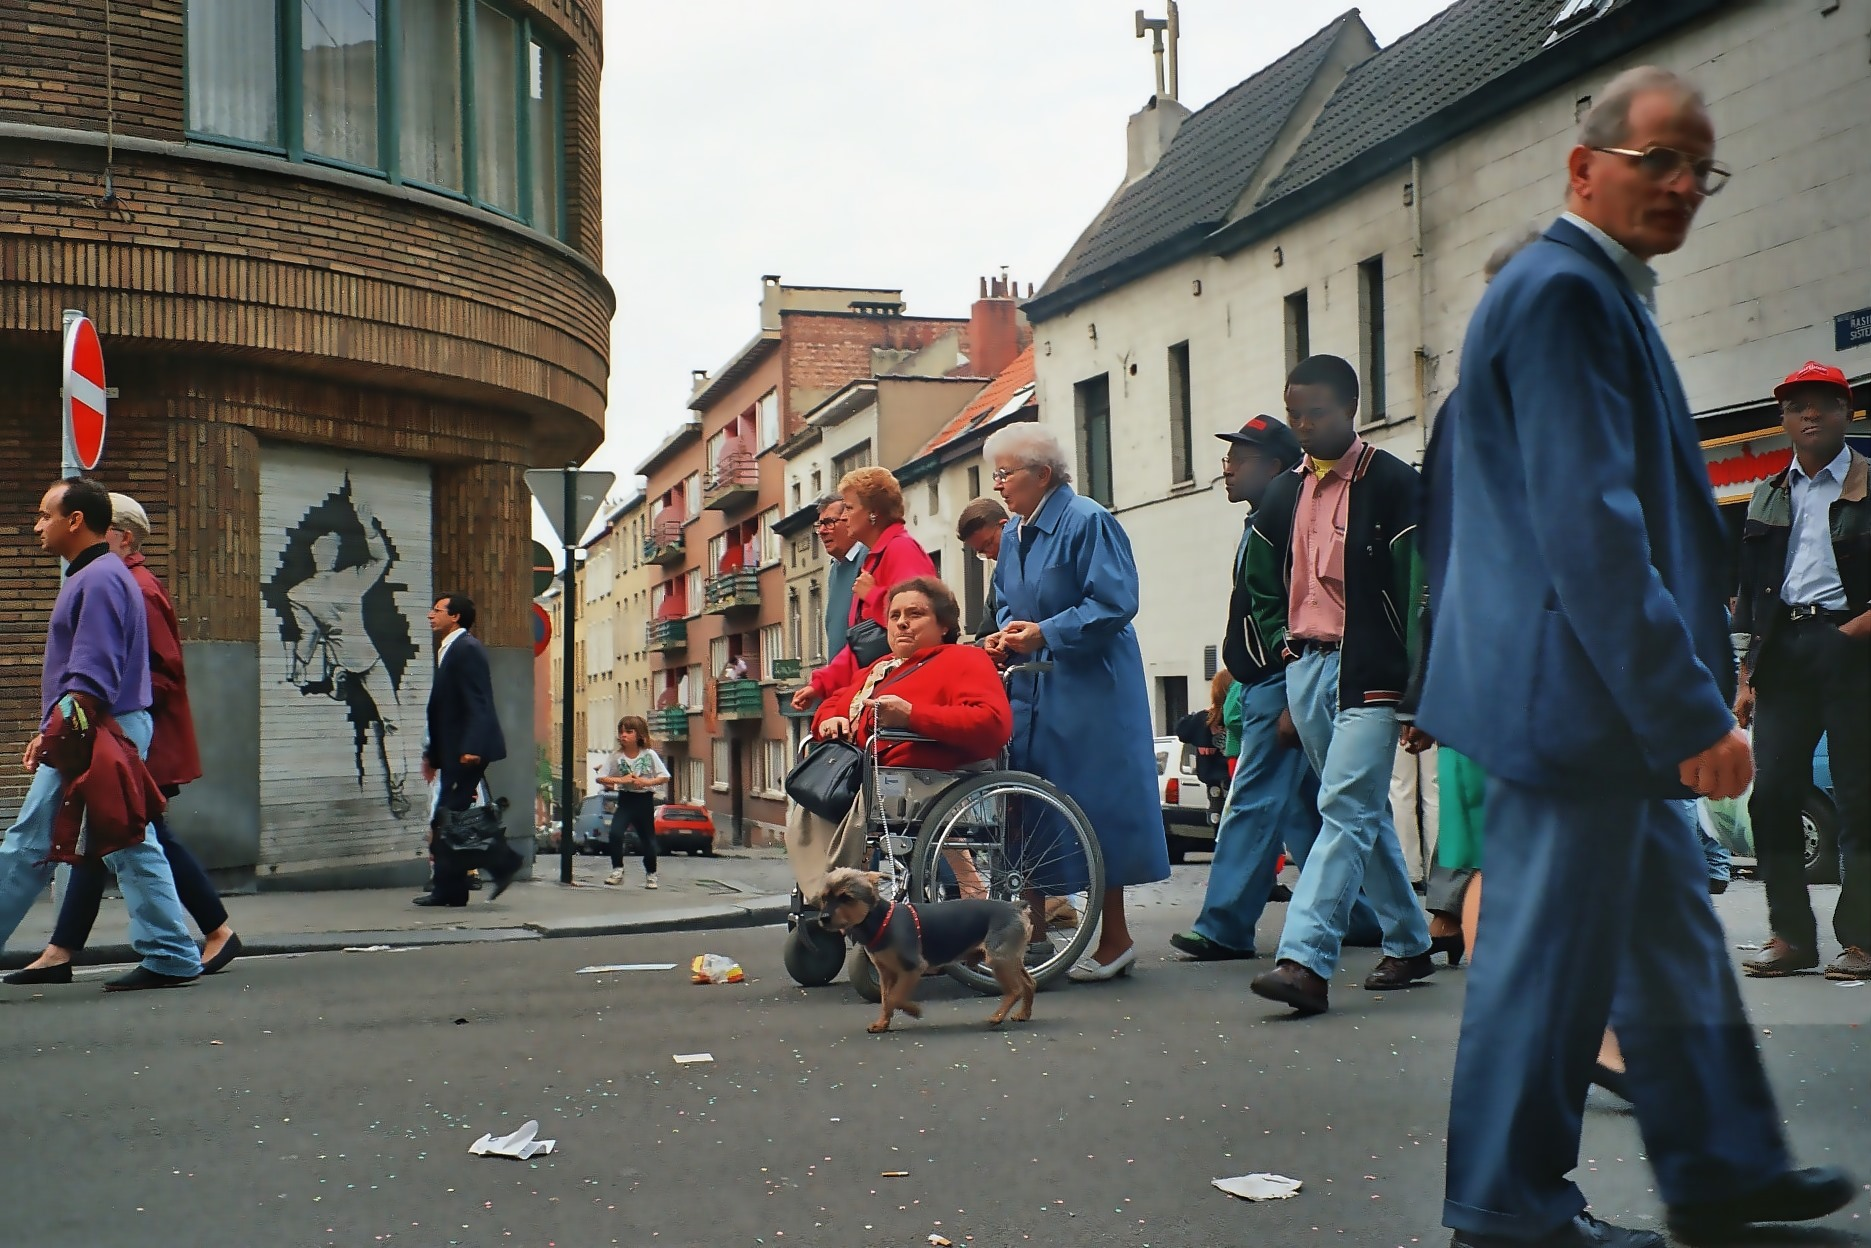 Quartier Les Marolles, multicultural neighborhood